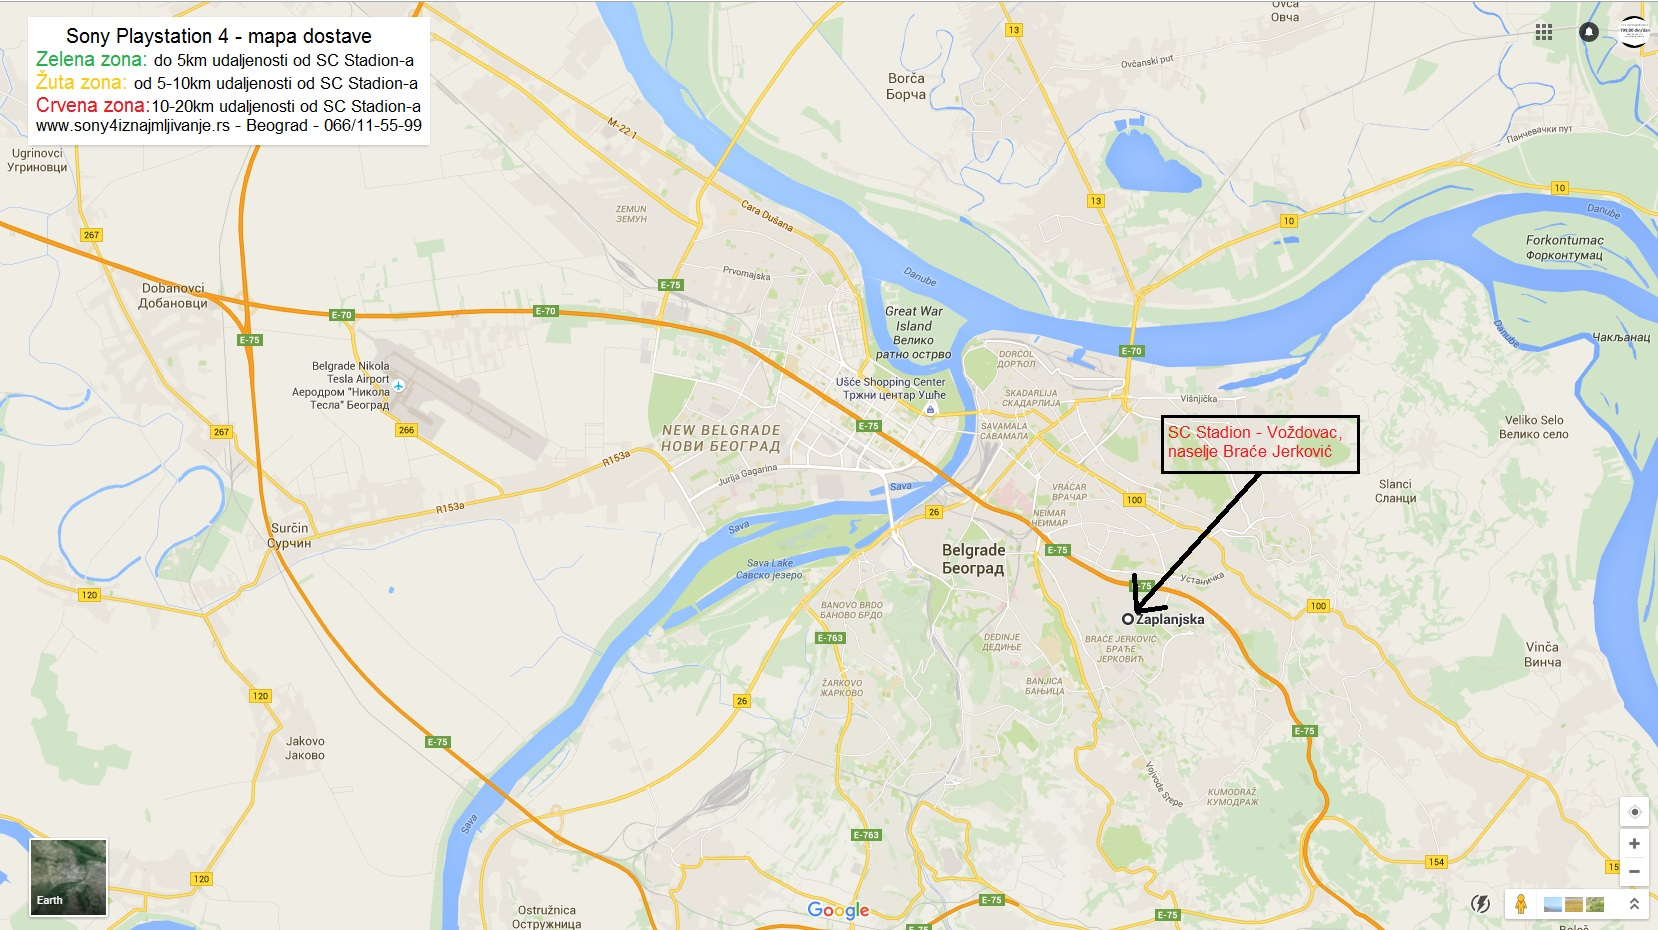 kanarevo brdo beograd mapa Dostava Sony Playstation konzola Beograd | Sony 4 iznajmljivanje kanarevo brdo beograd mapa